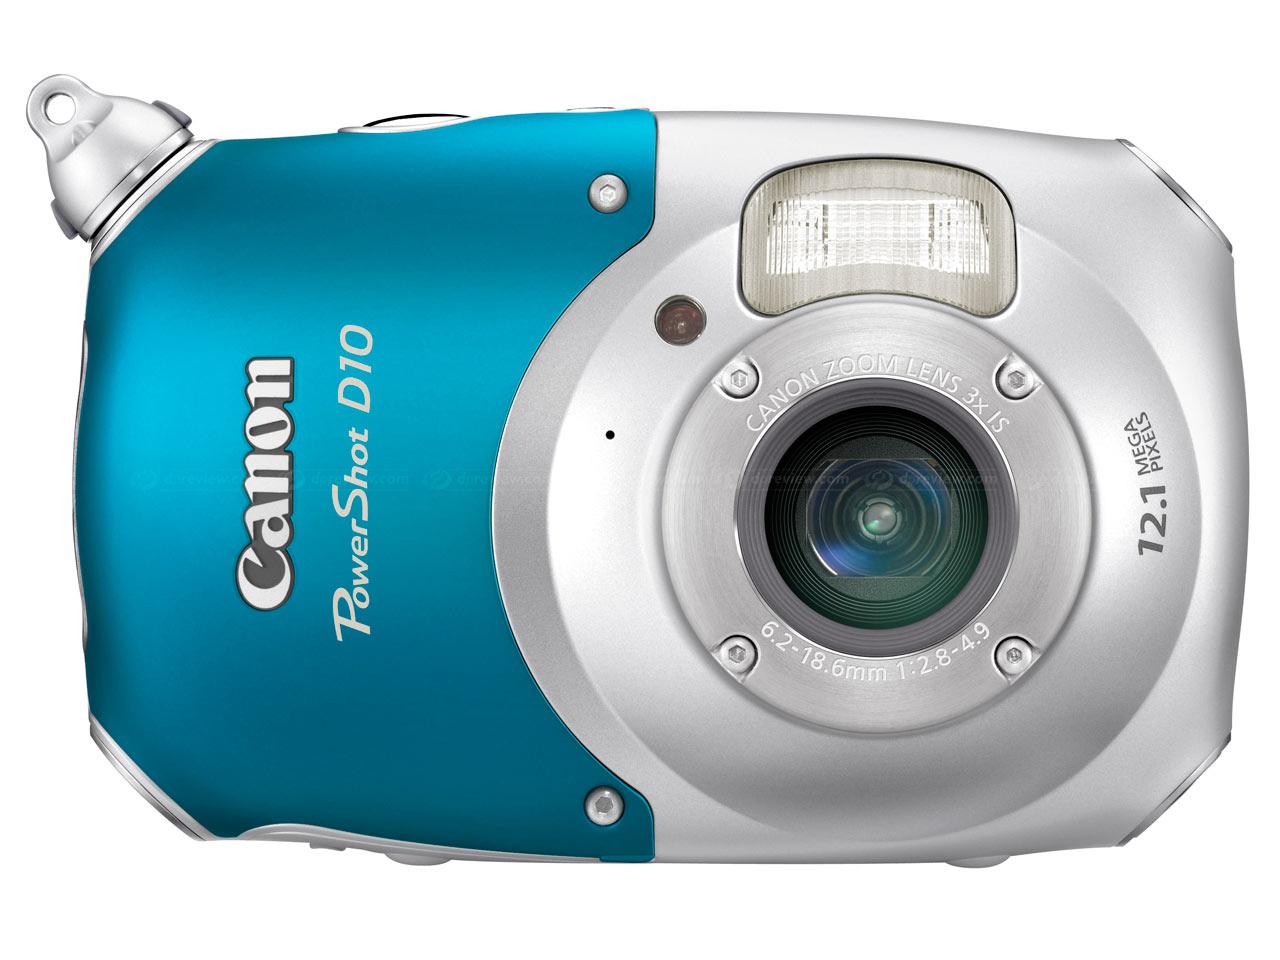 digital photography camera - photo #49